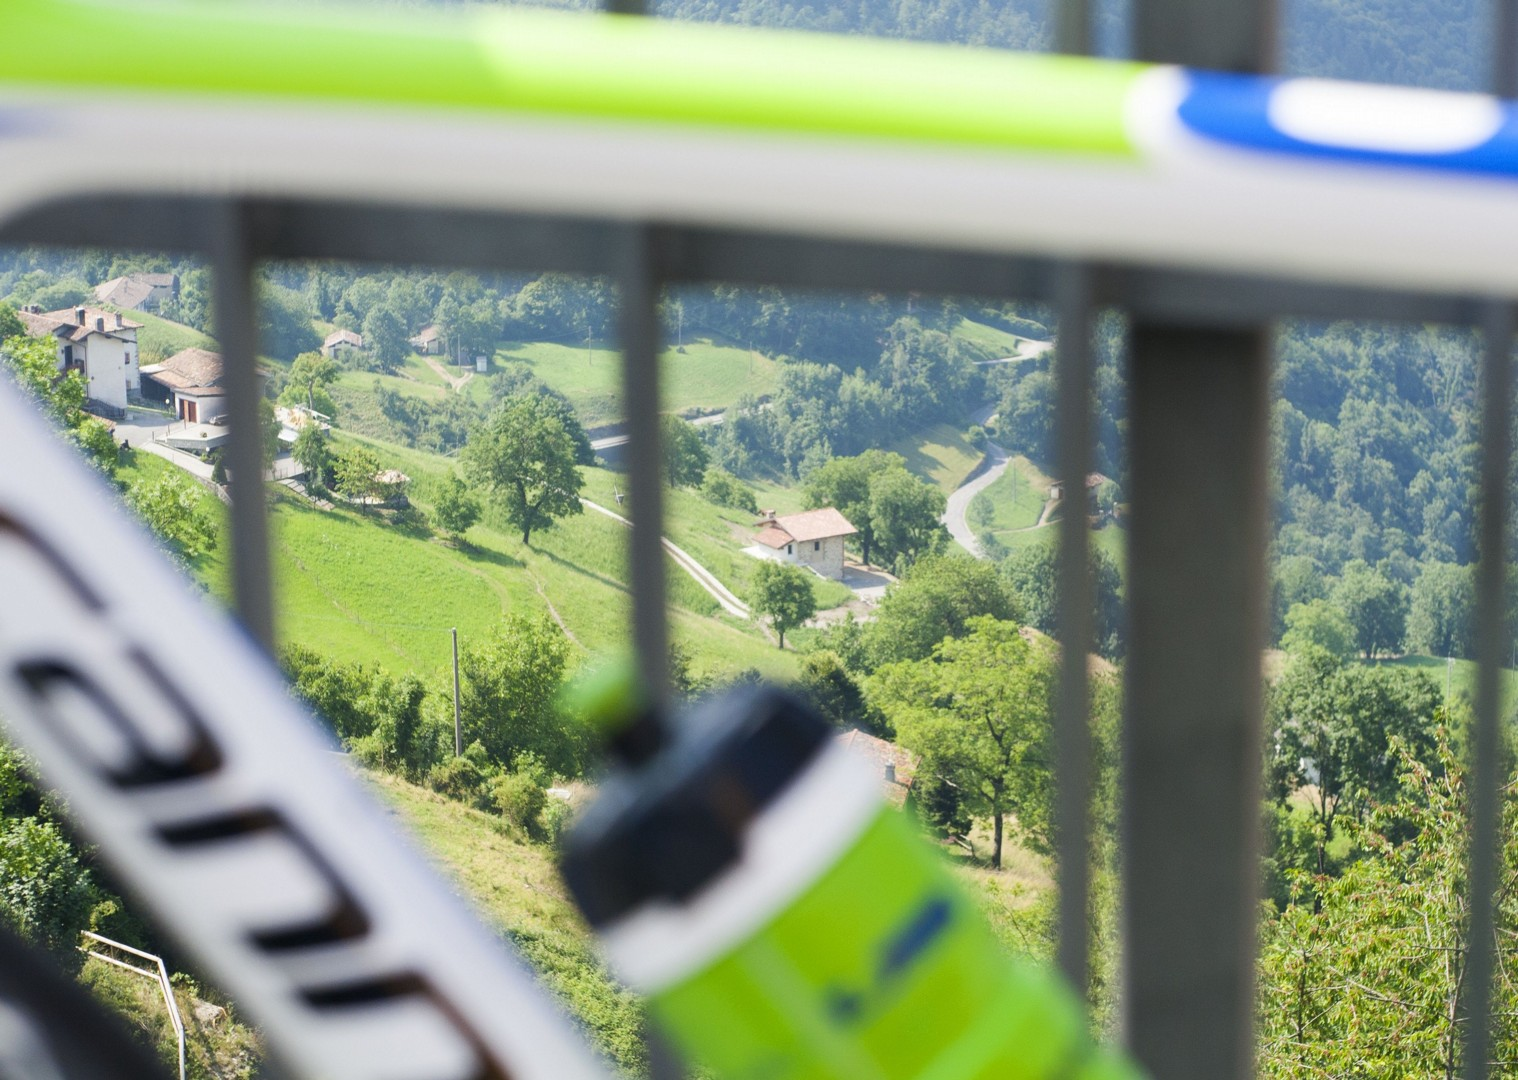 lombardia8.jpg - Italy - Lakes of Lombardia - Guided Road Cycling Holiday - Road Cycling